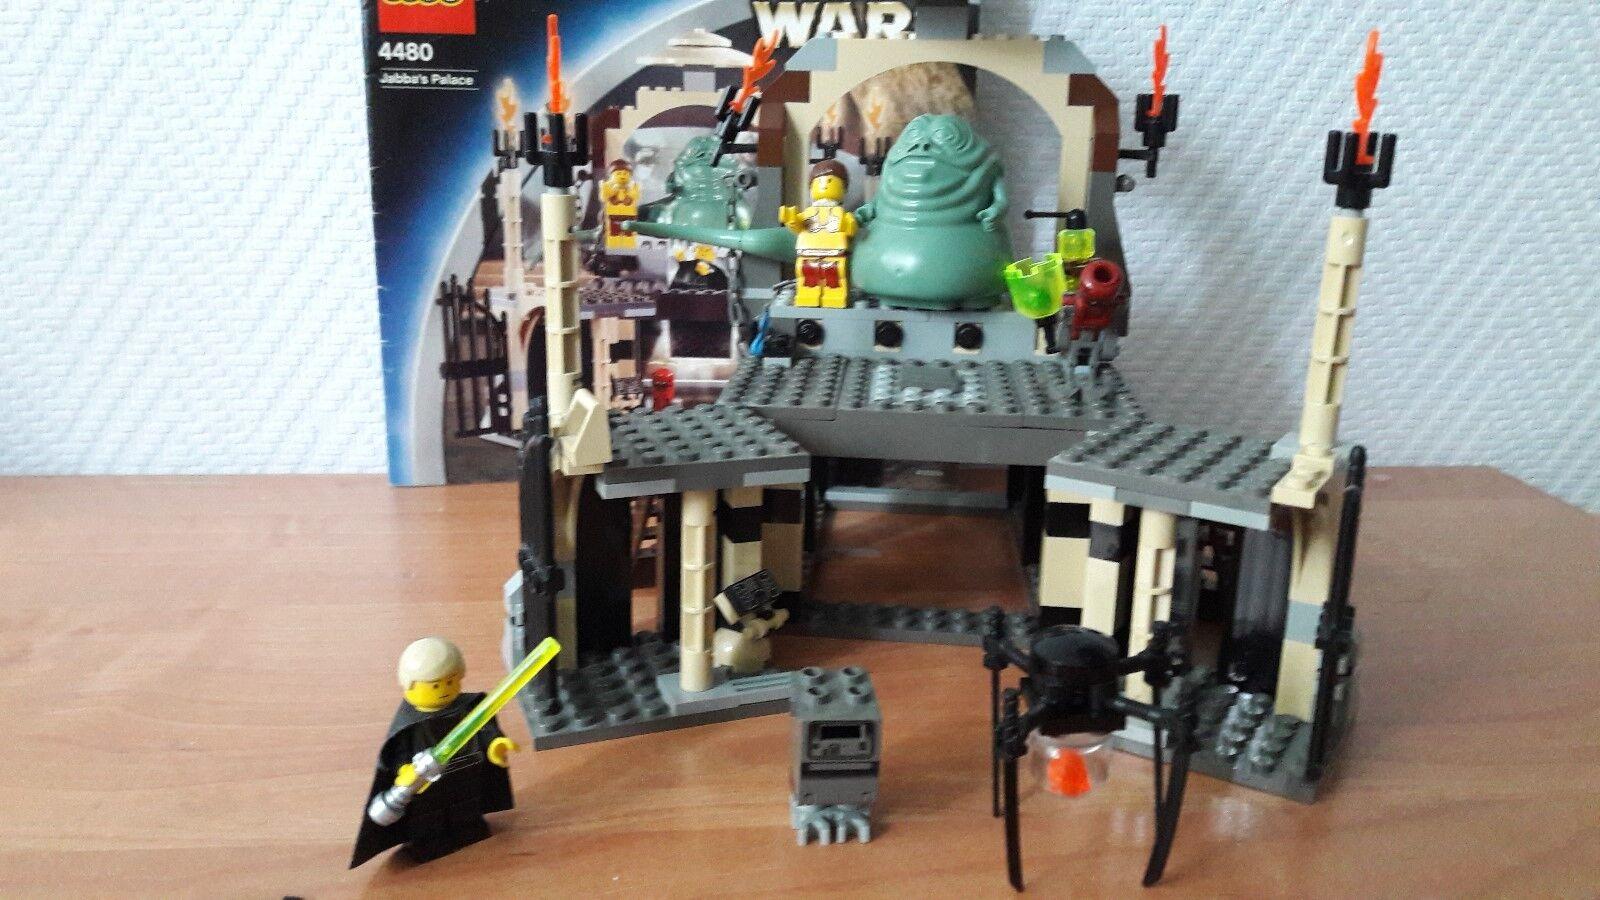 LEGO Star Wars 4480 Jabba's Palace mit Bauanleitung